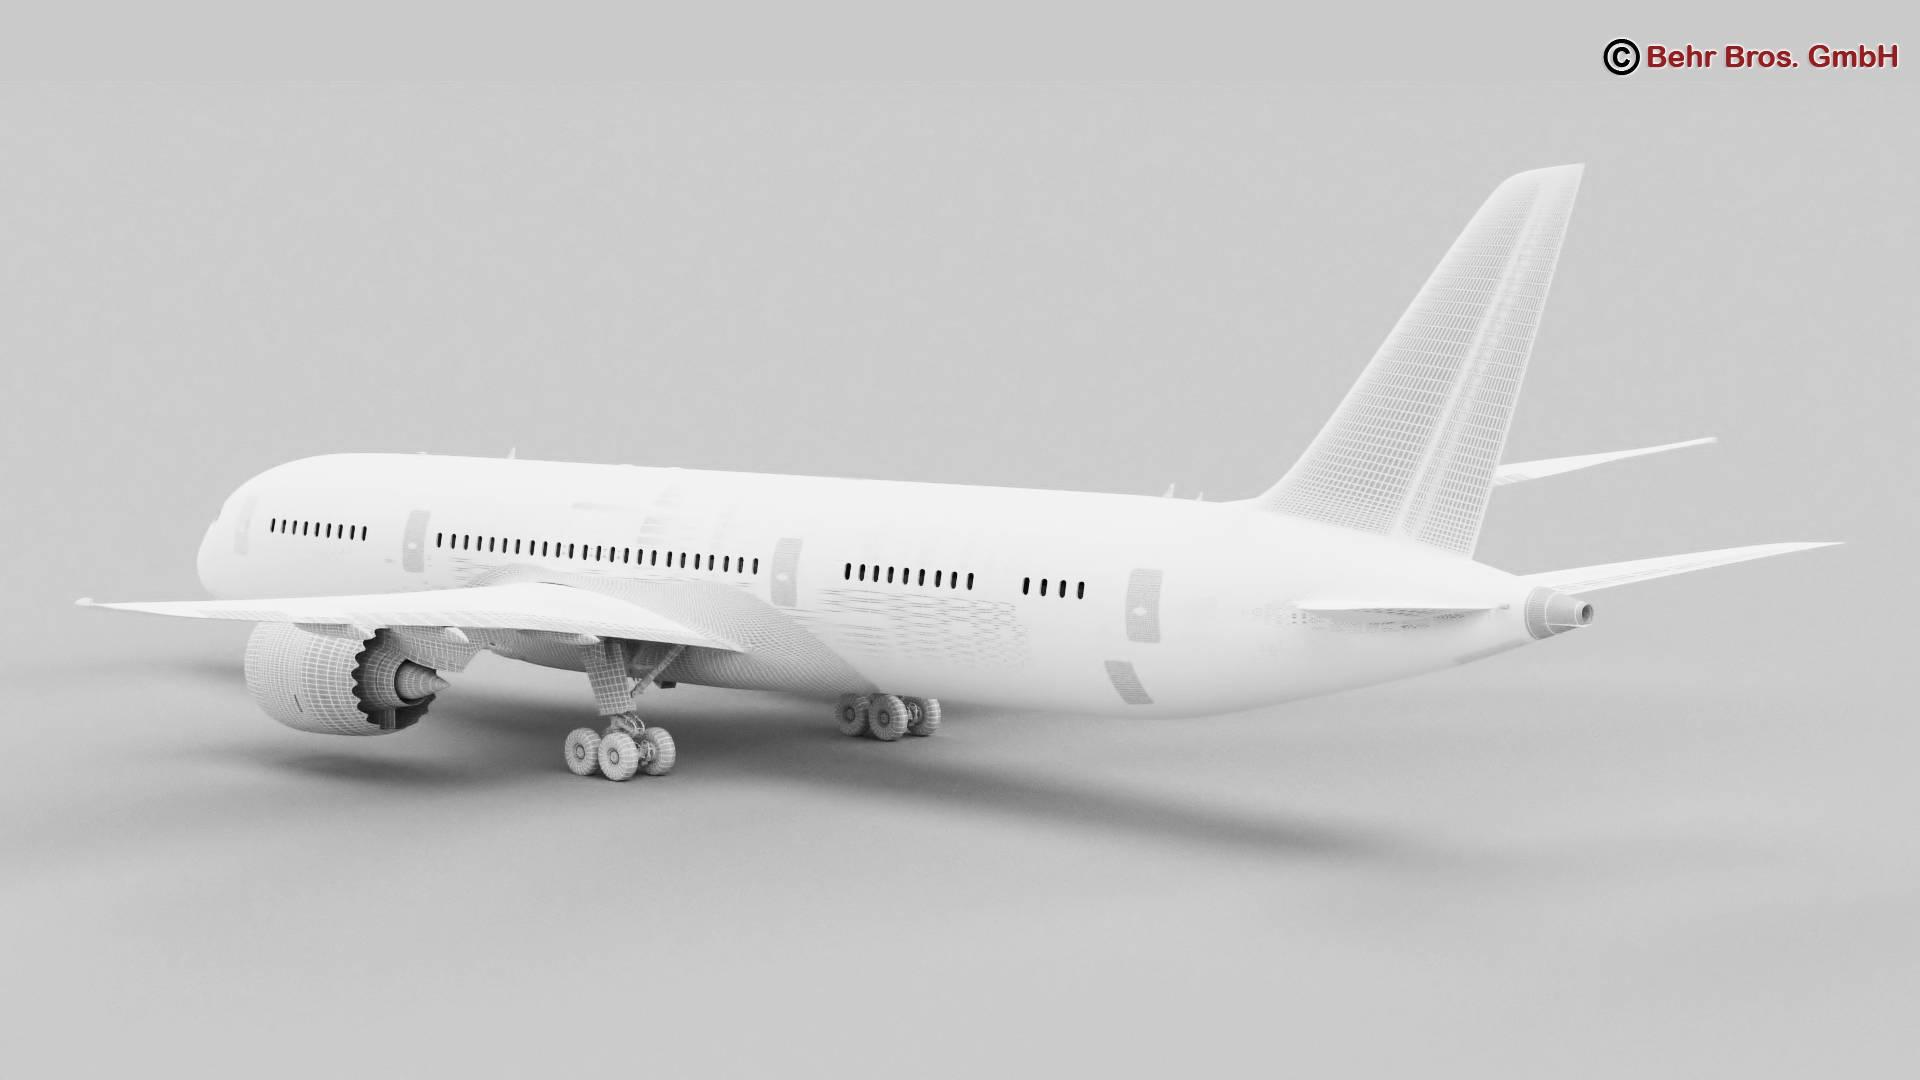 Boeing 787-8 3d gerð 3ds max fbx c4d lwo ma mb obj 251374